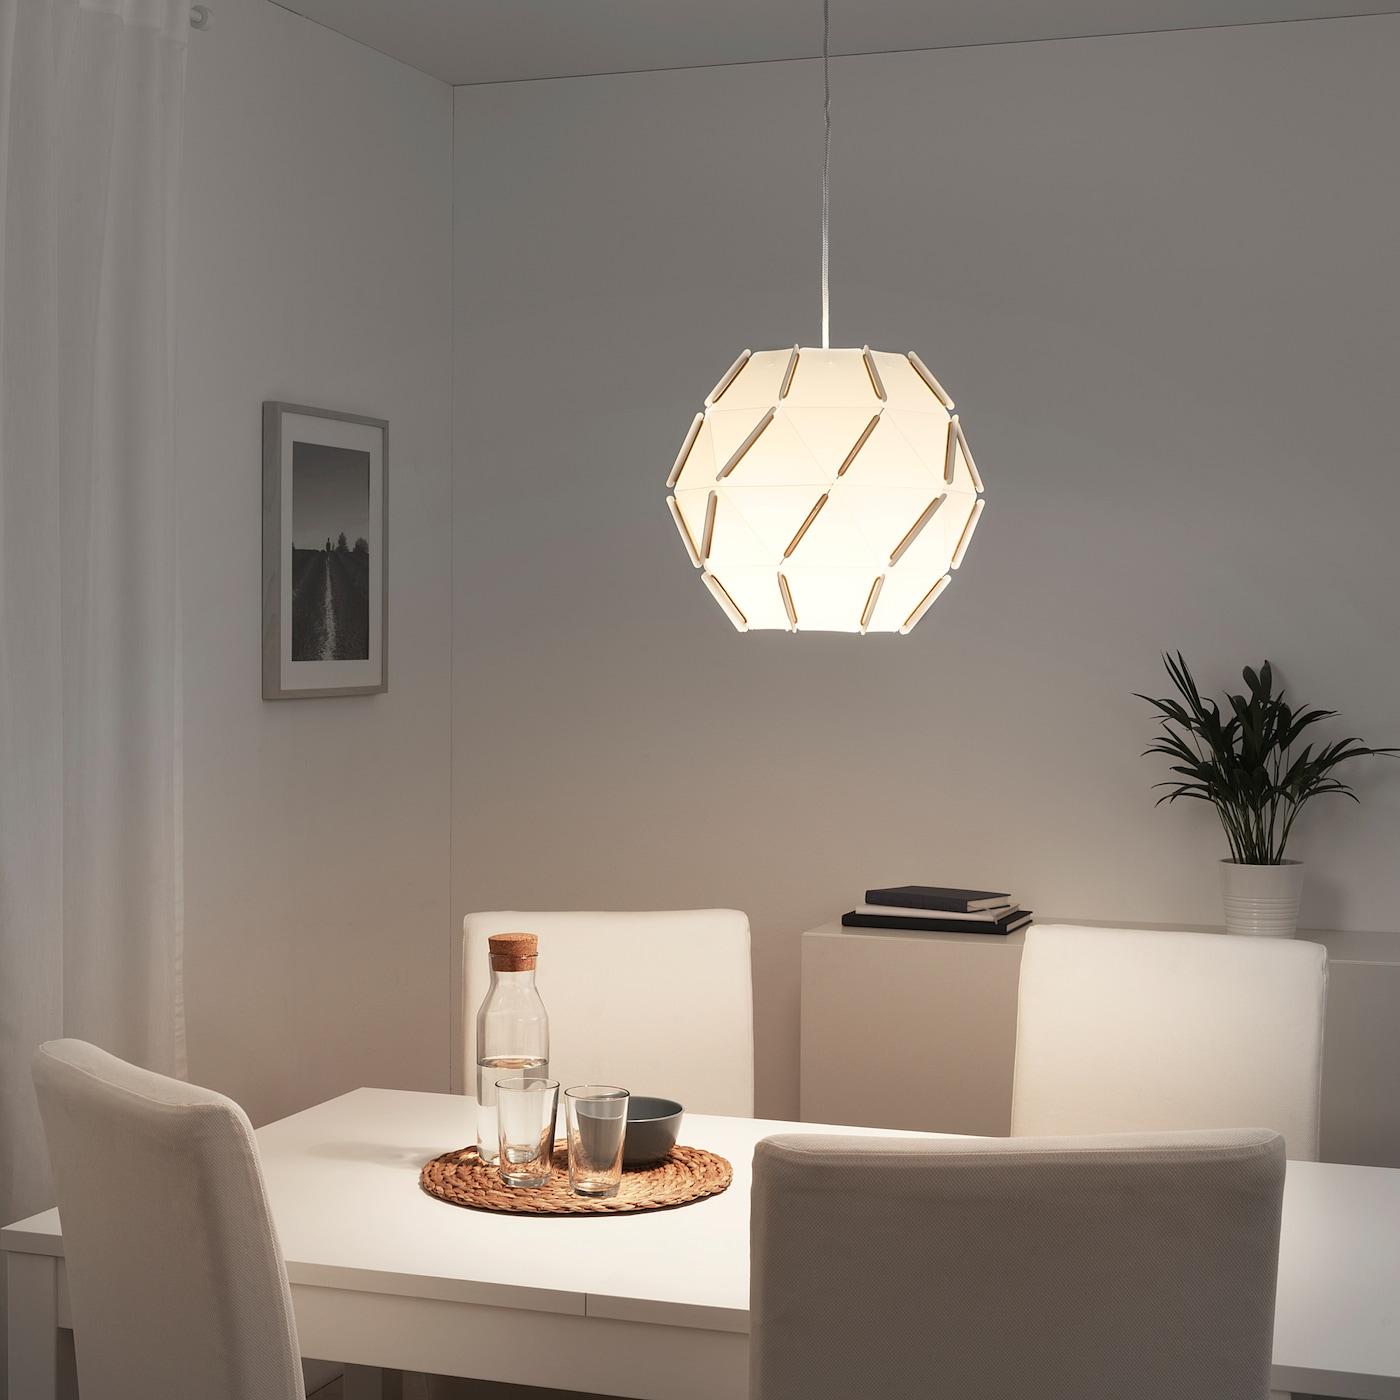 Sjopenna Hanglamp Rond 35 Cm Ikea